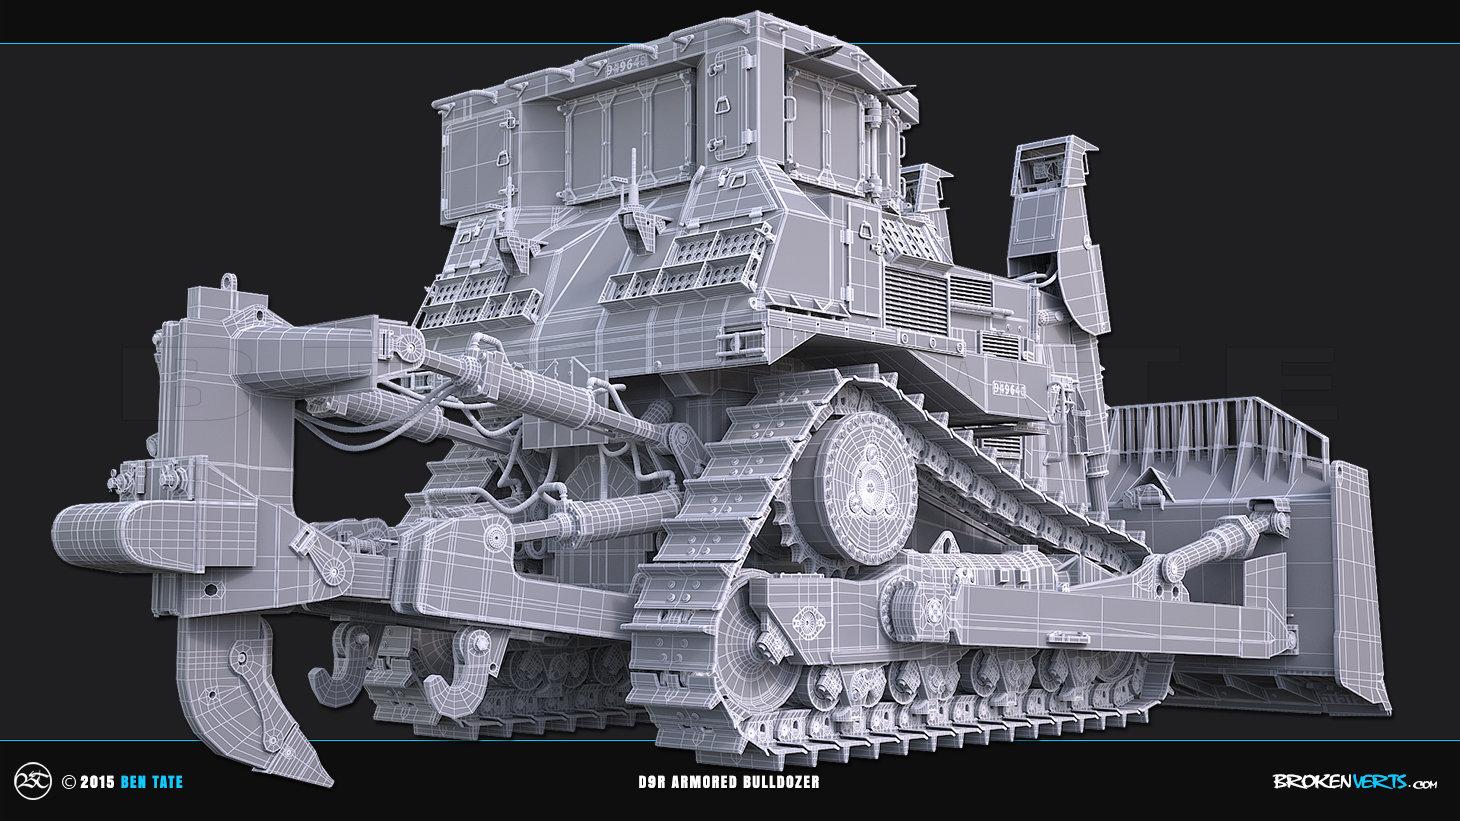 D9R Amored Bulldozer 3D Model | Ben Tate | 3ds Max |VRay |3d CG VFX